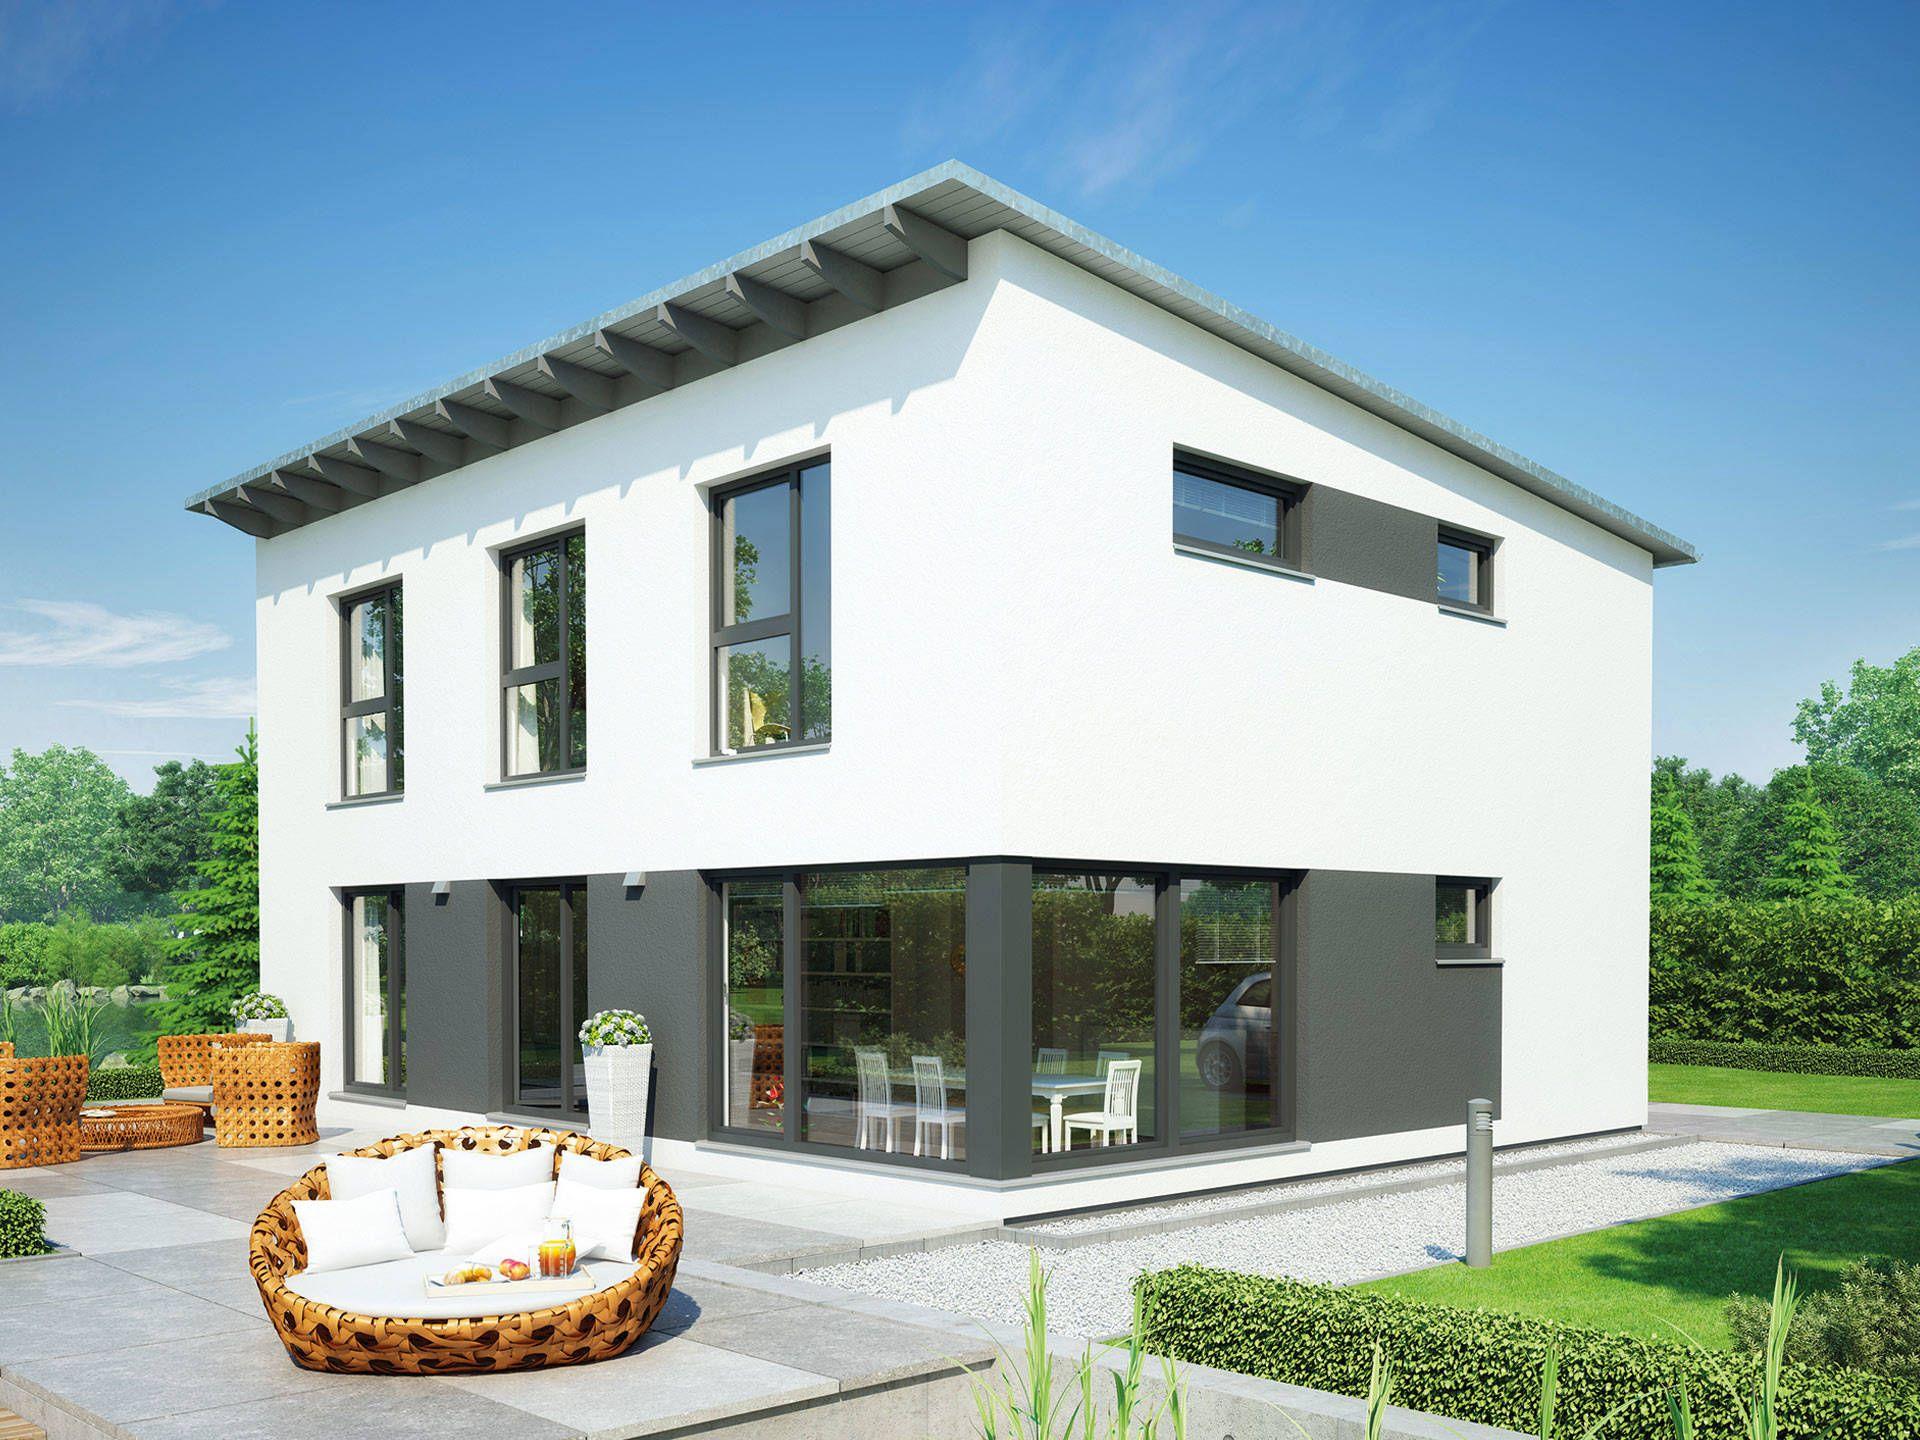 Vita 165 Von Hanse Haus Hanse Haus Haus Architektur Haus